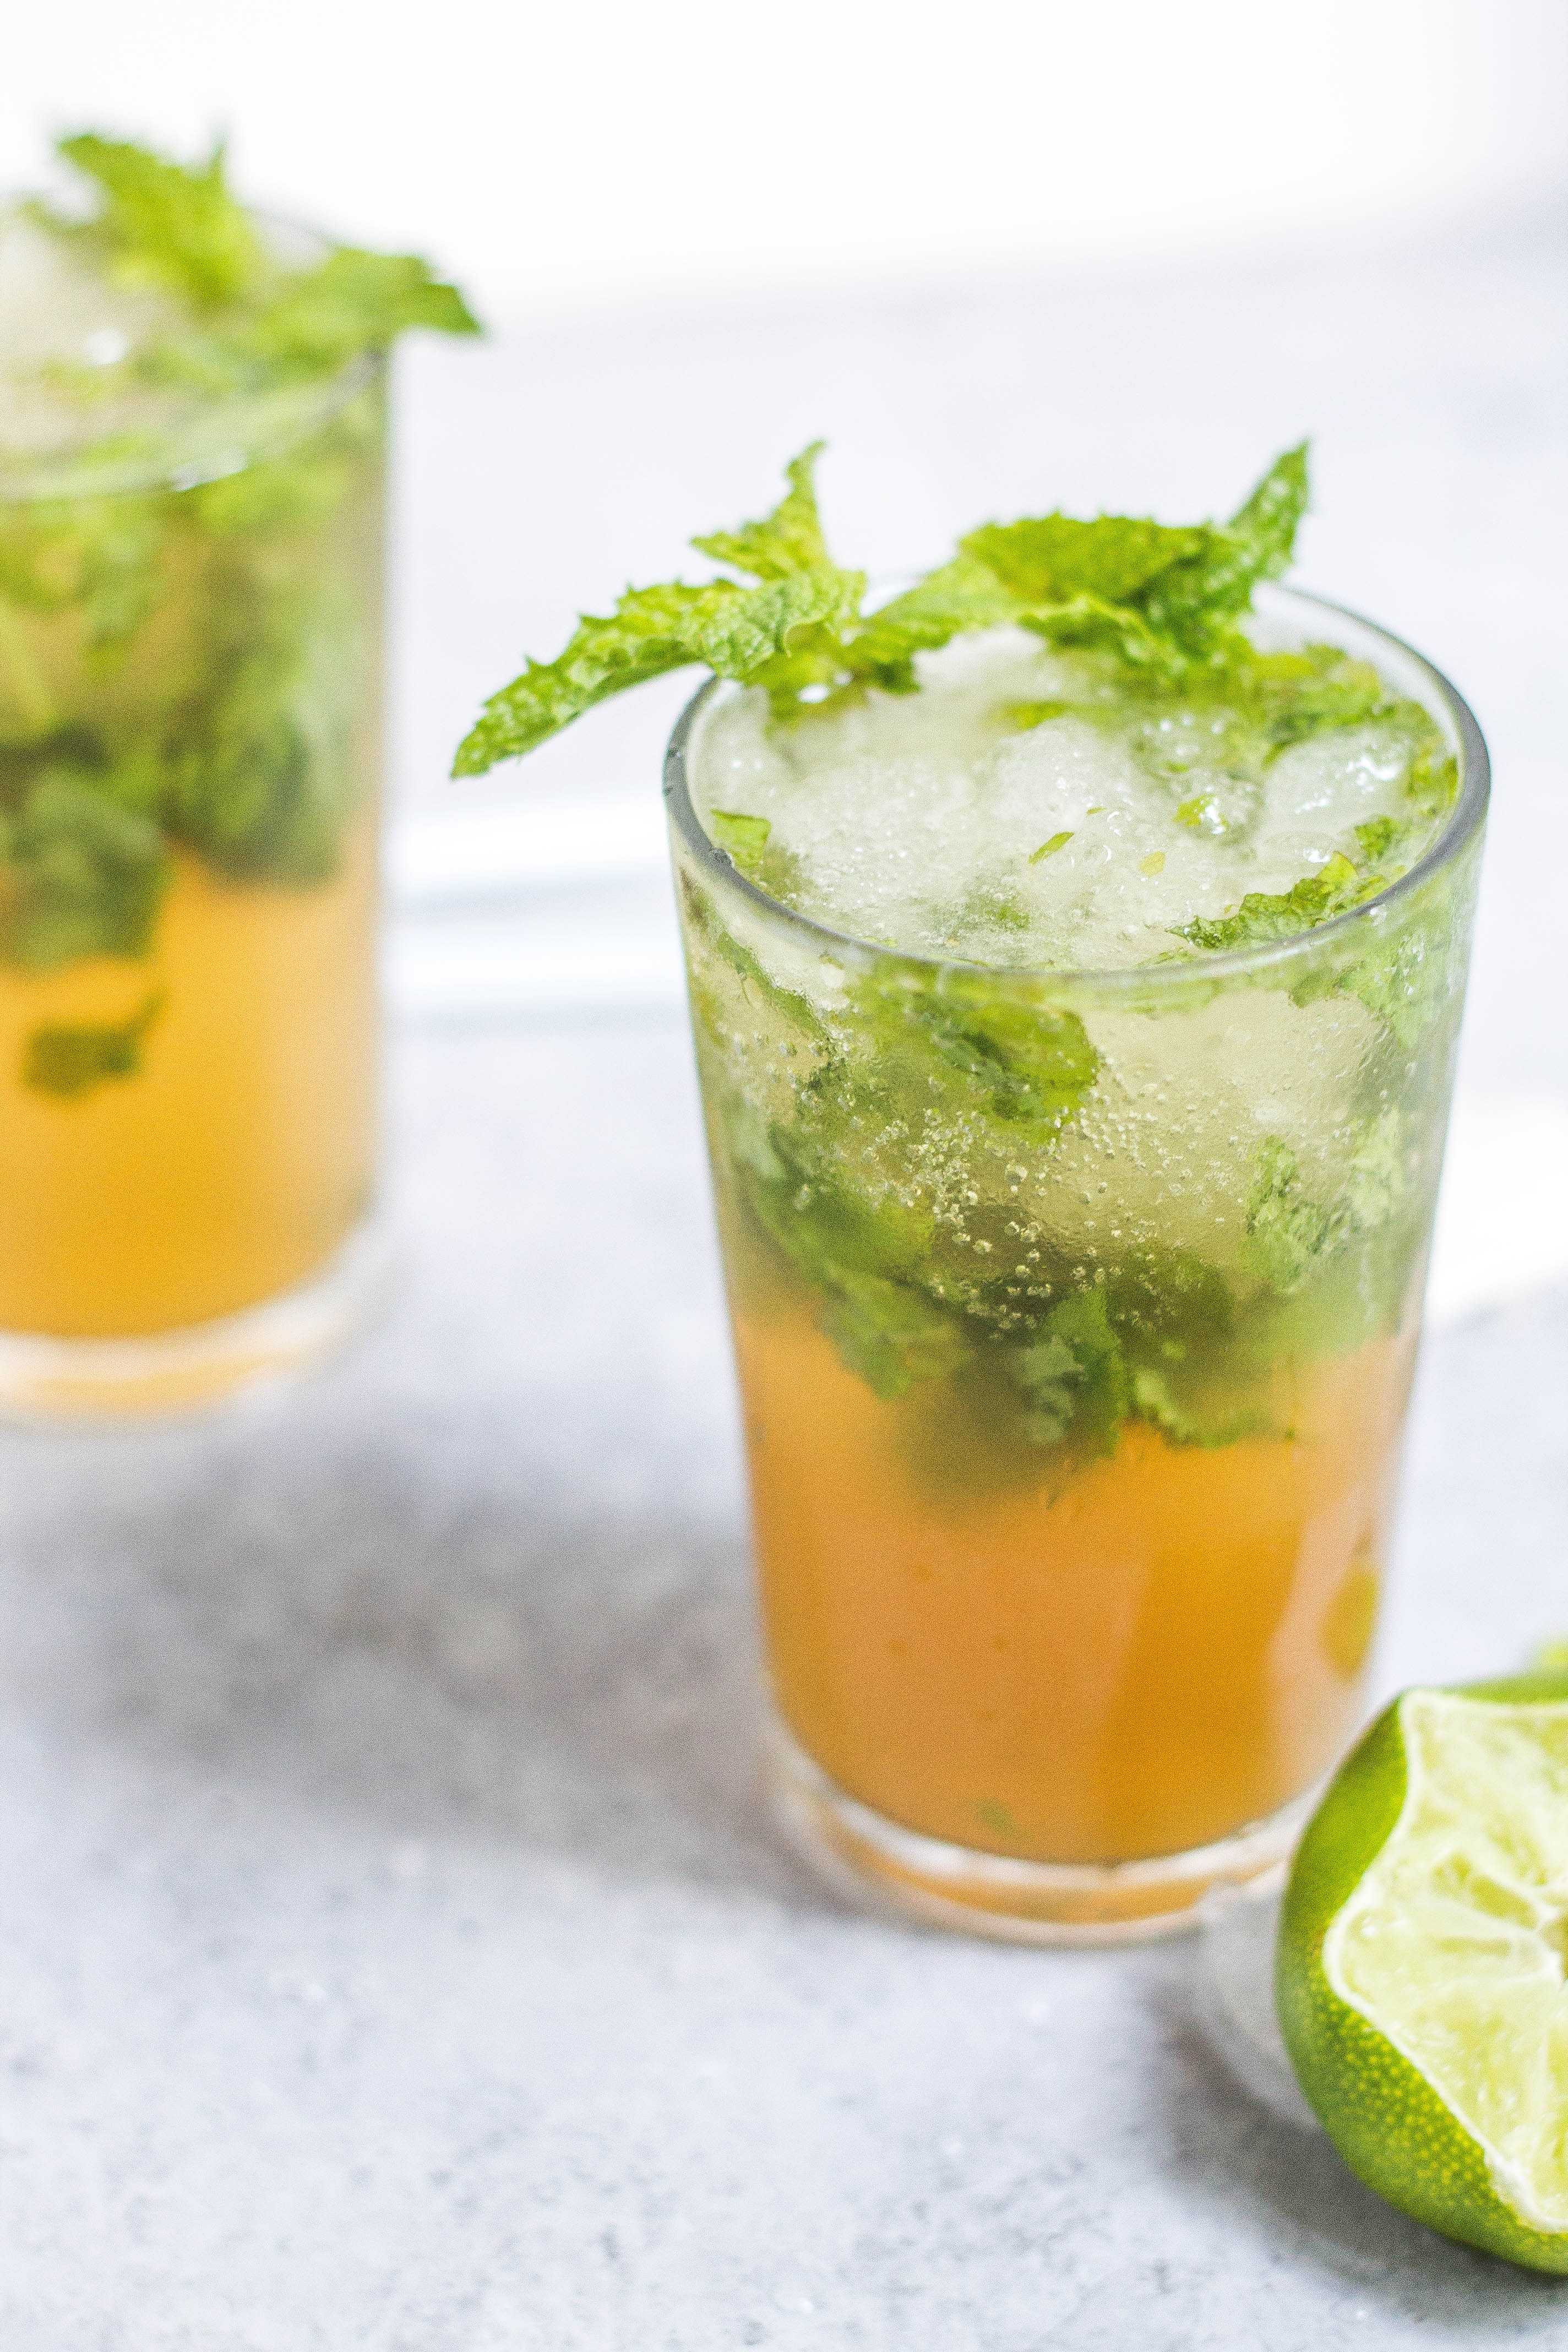 Japanese iced Sencha green tea